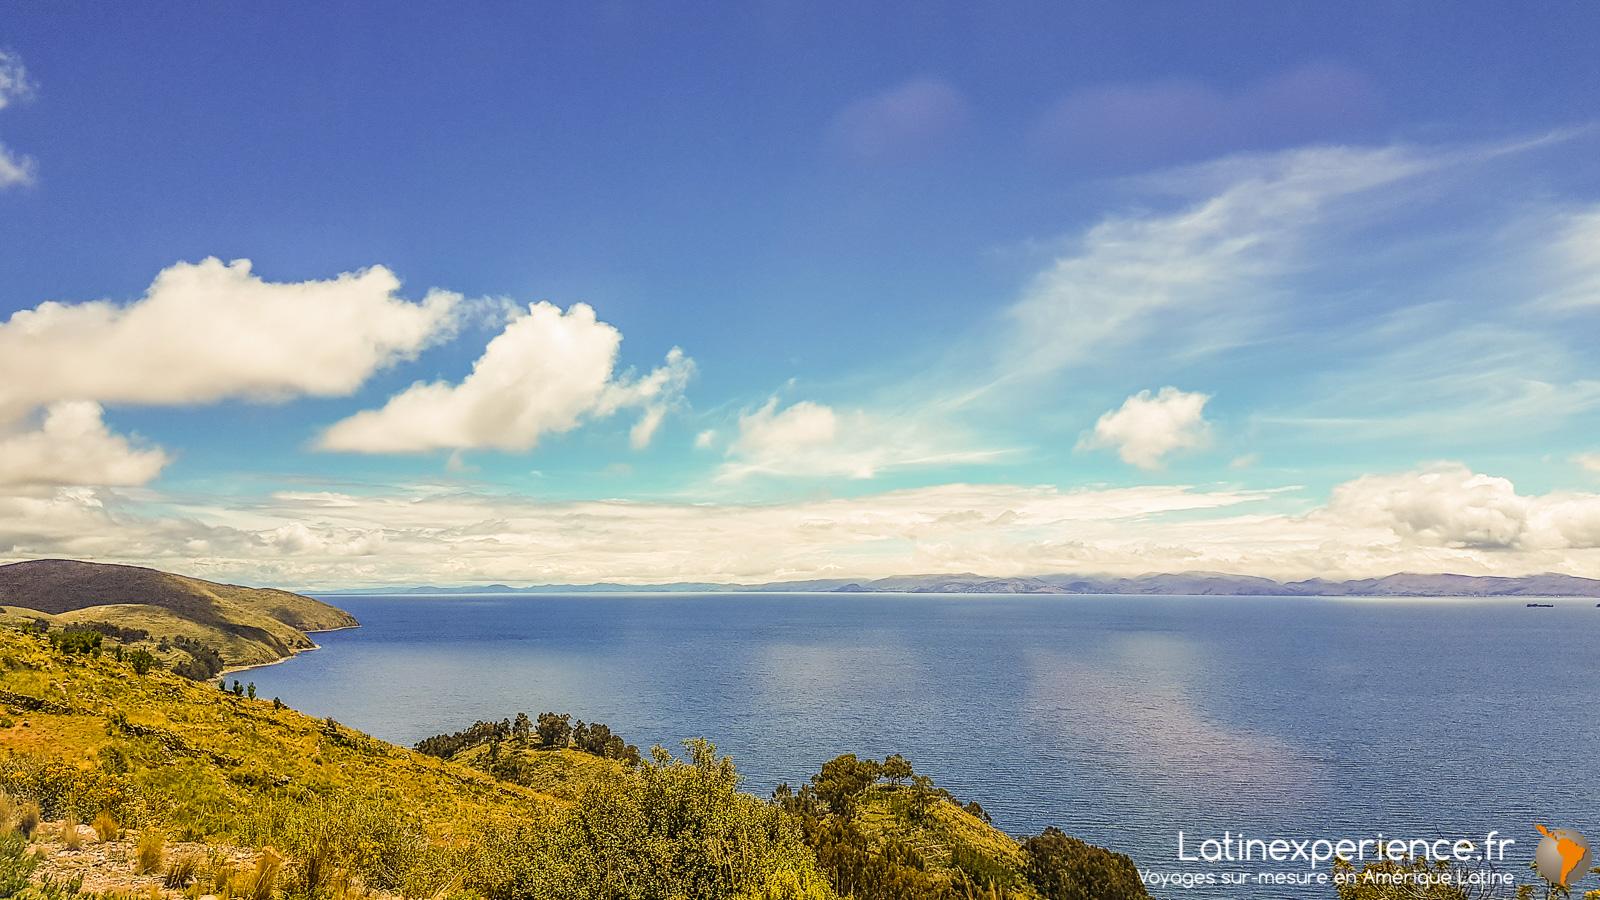 Pérou - Road Trip - Lac Titicaca - Latinexperience voyages